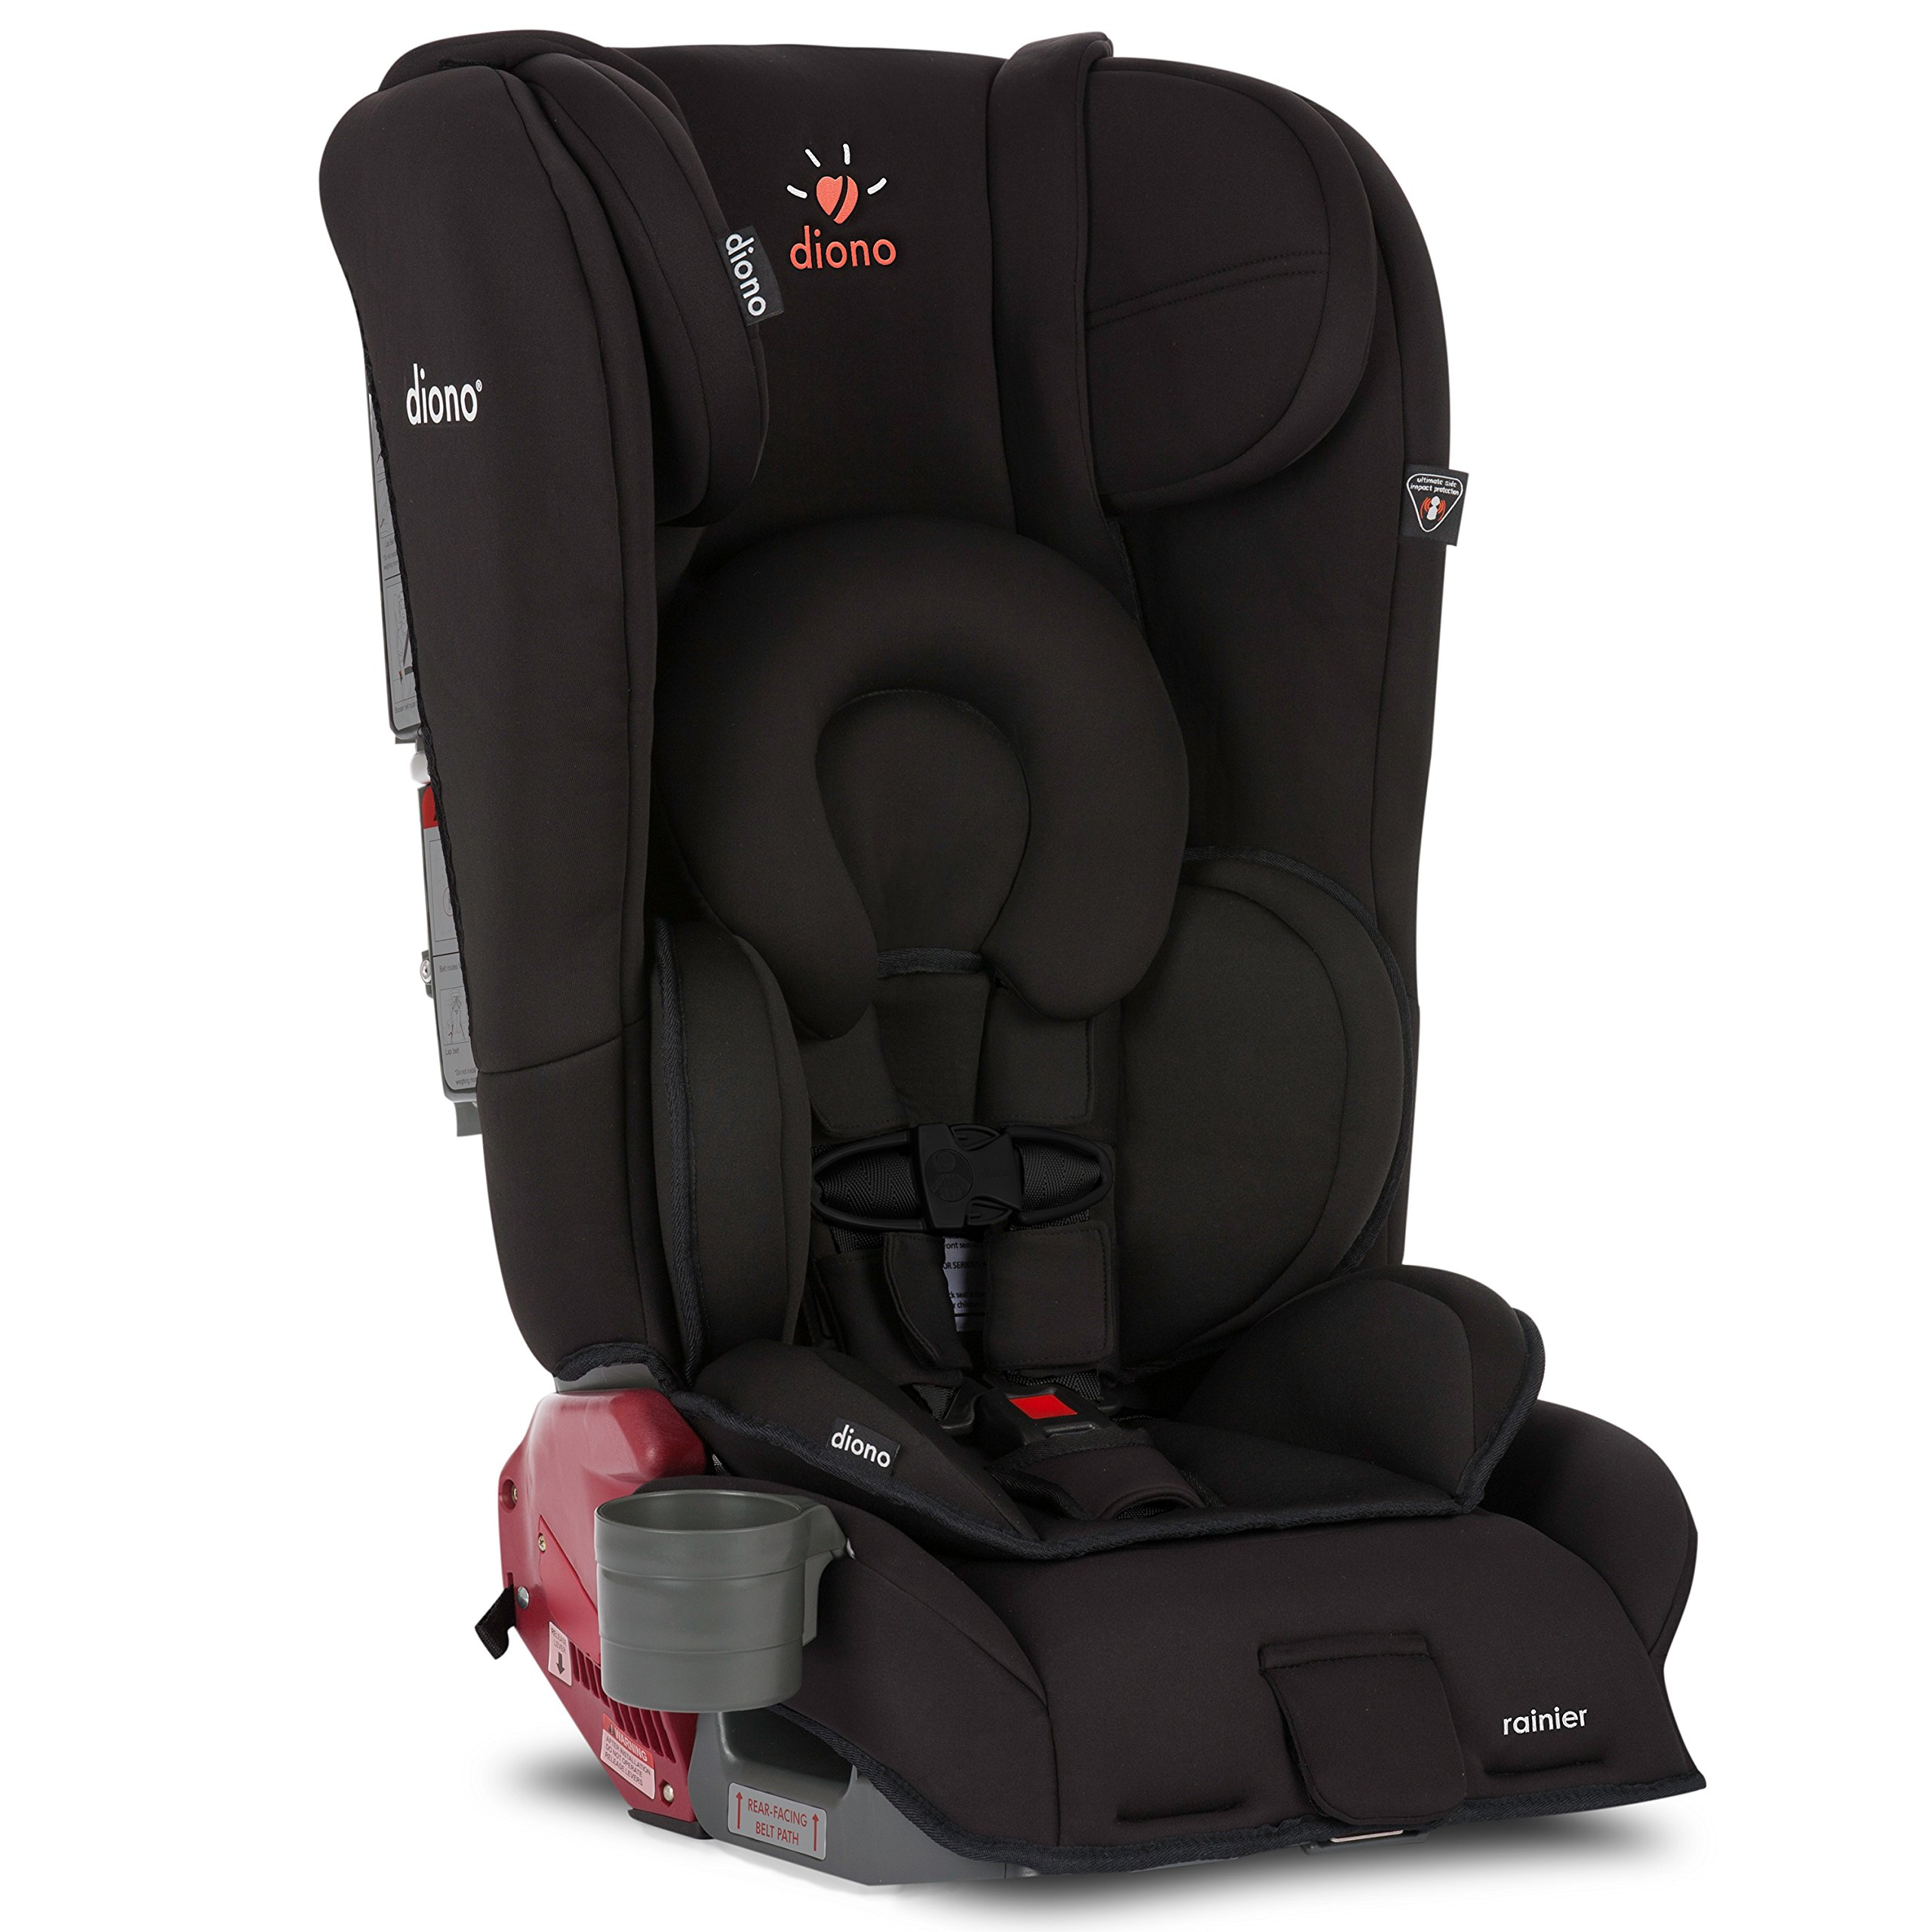 Diono Rainier All-In-One Convertible Car Seat, Midnight